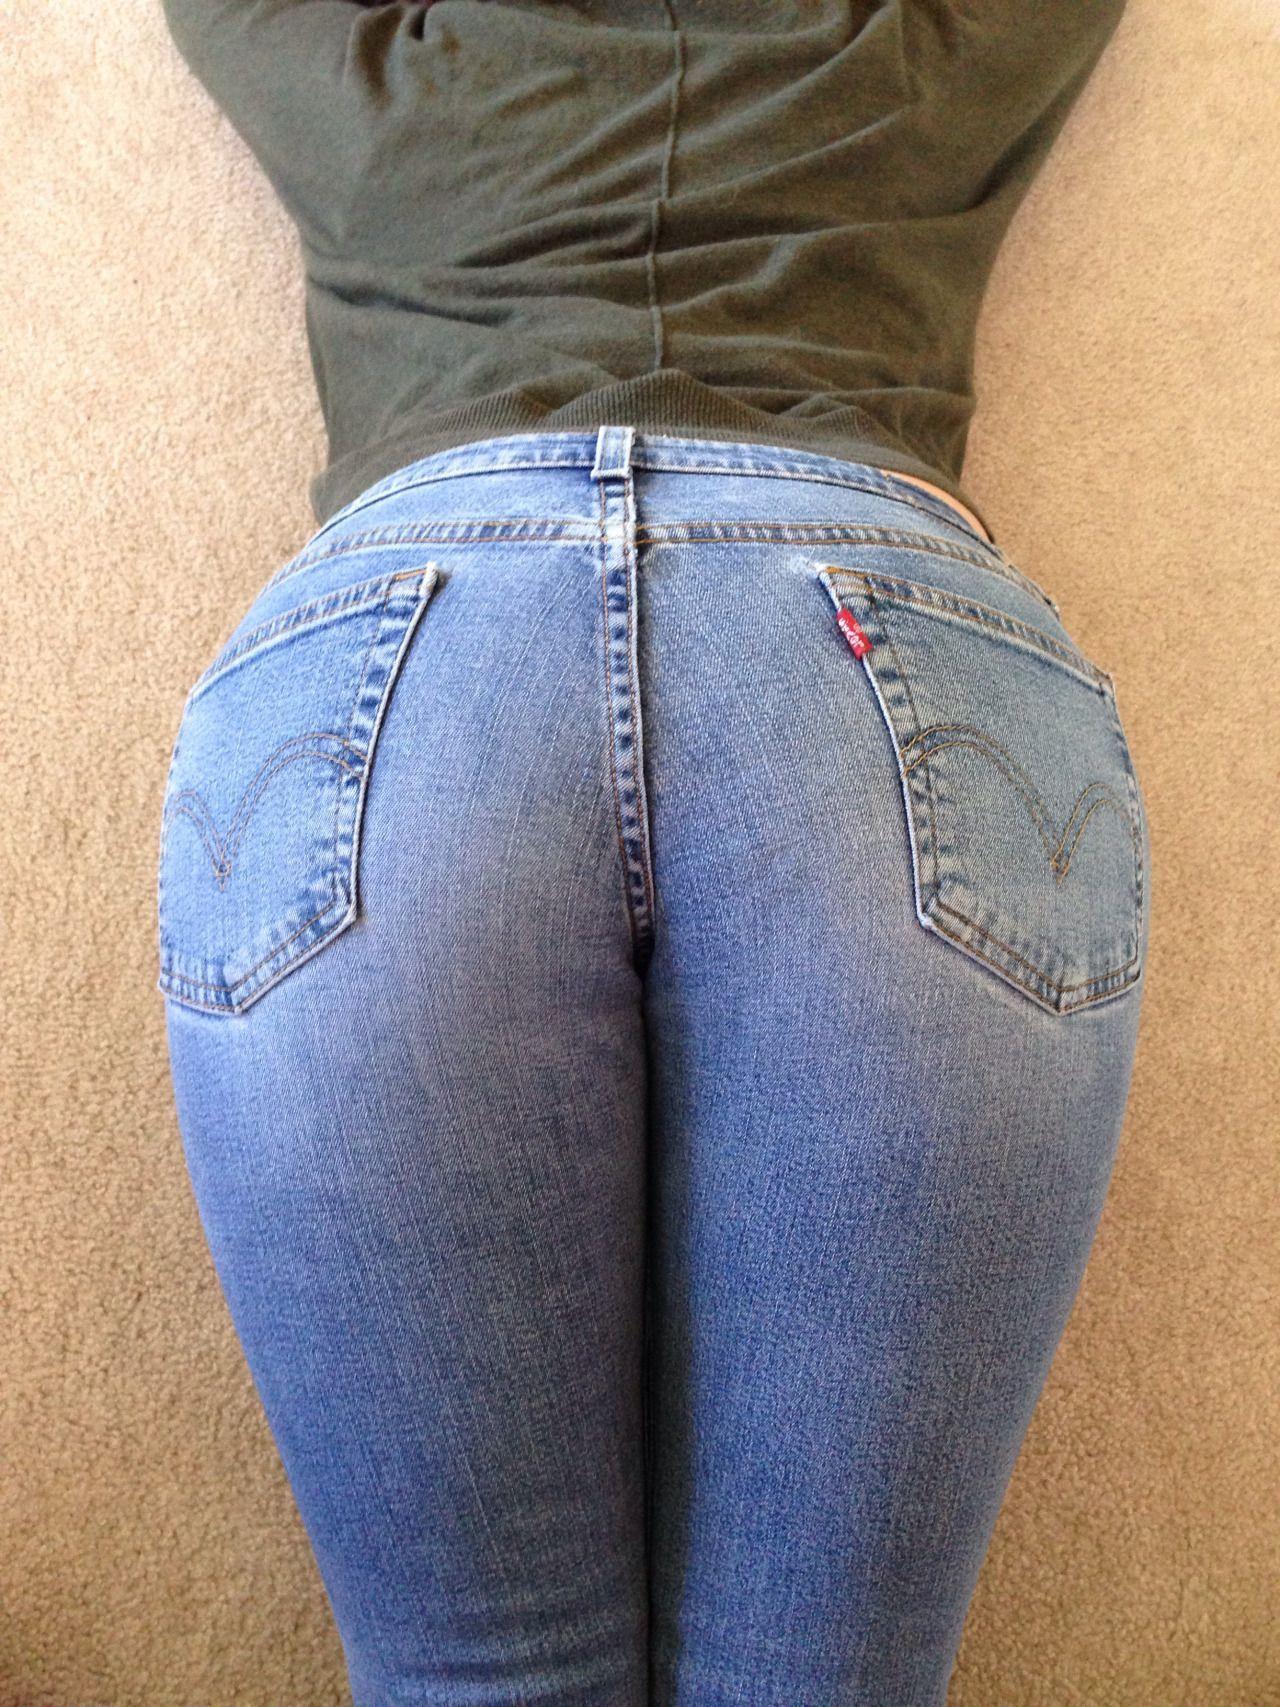 Short-Fuse reccomend Fetish brand jeans